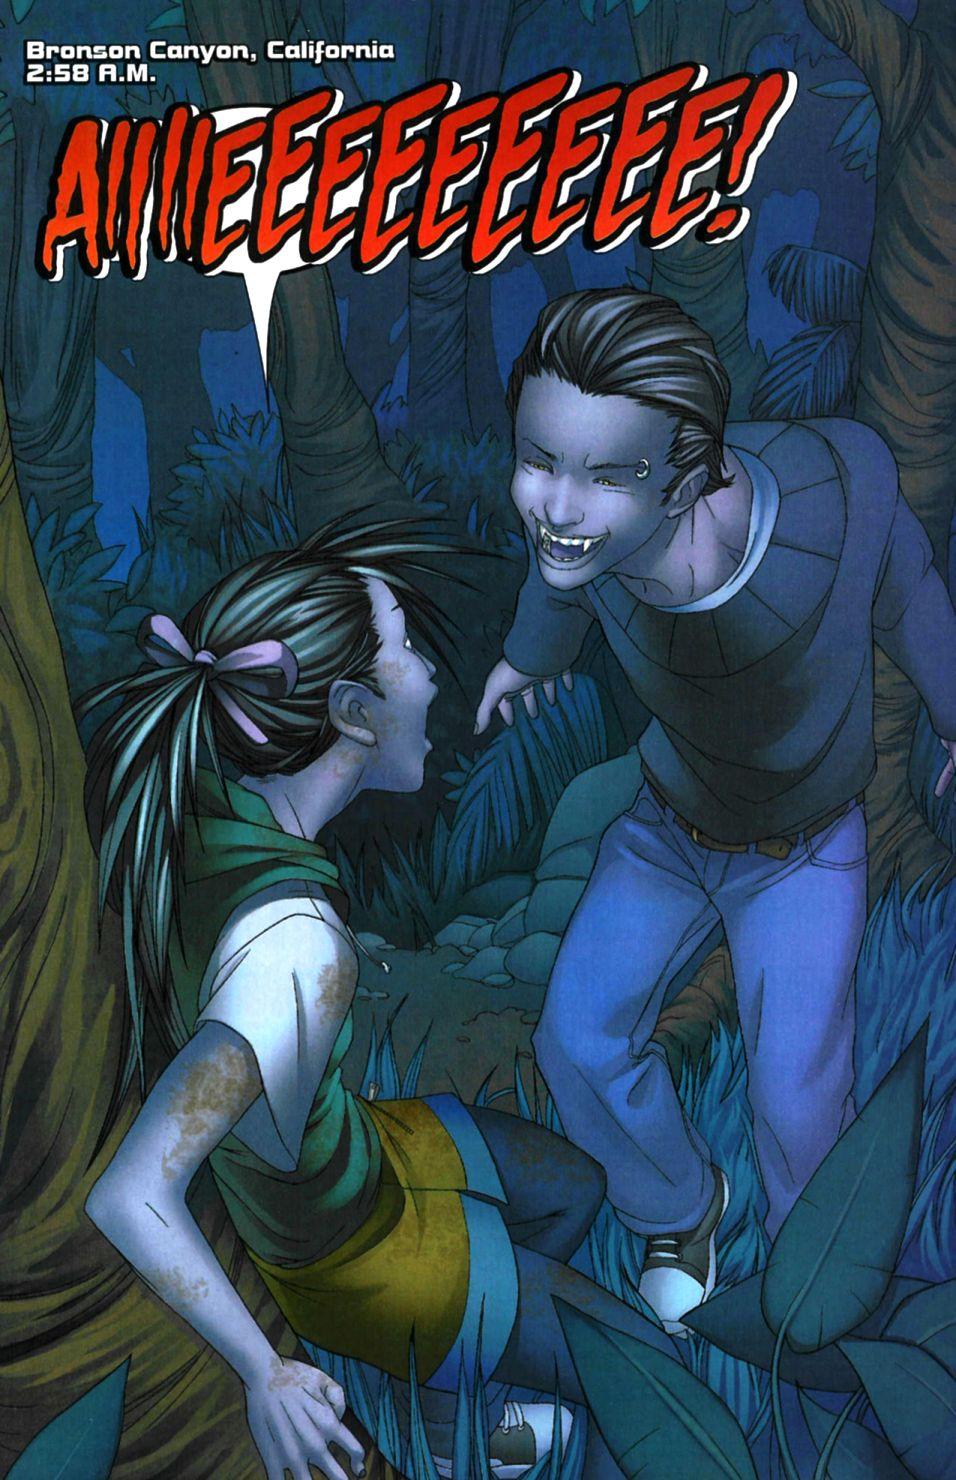 Runaways vol. 1 #10